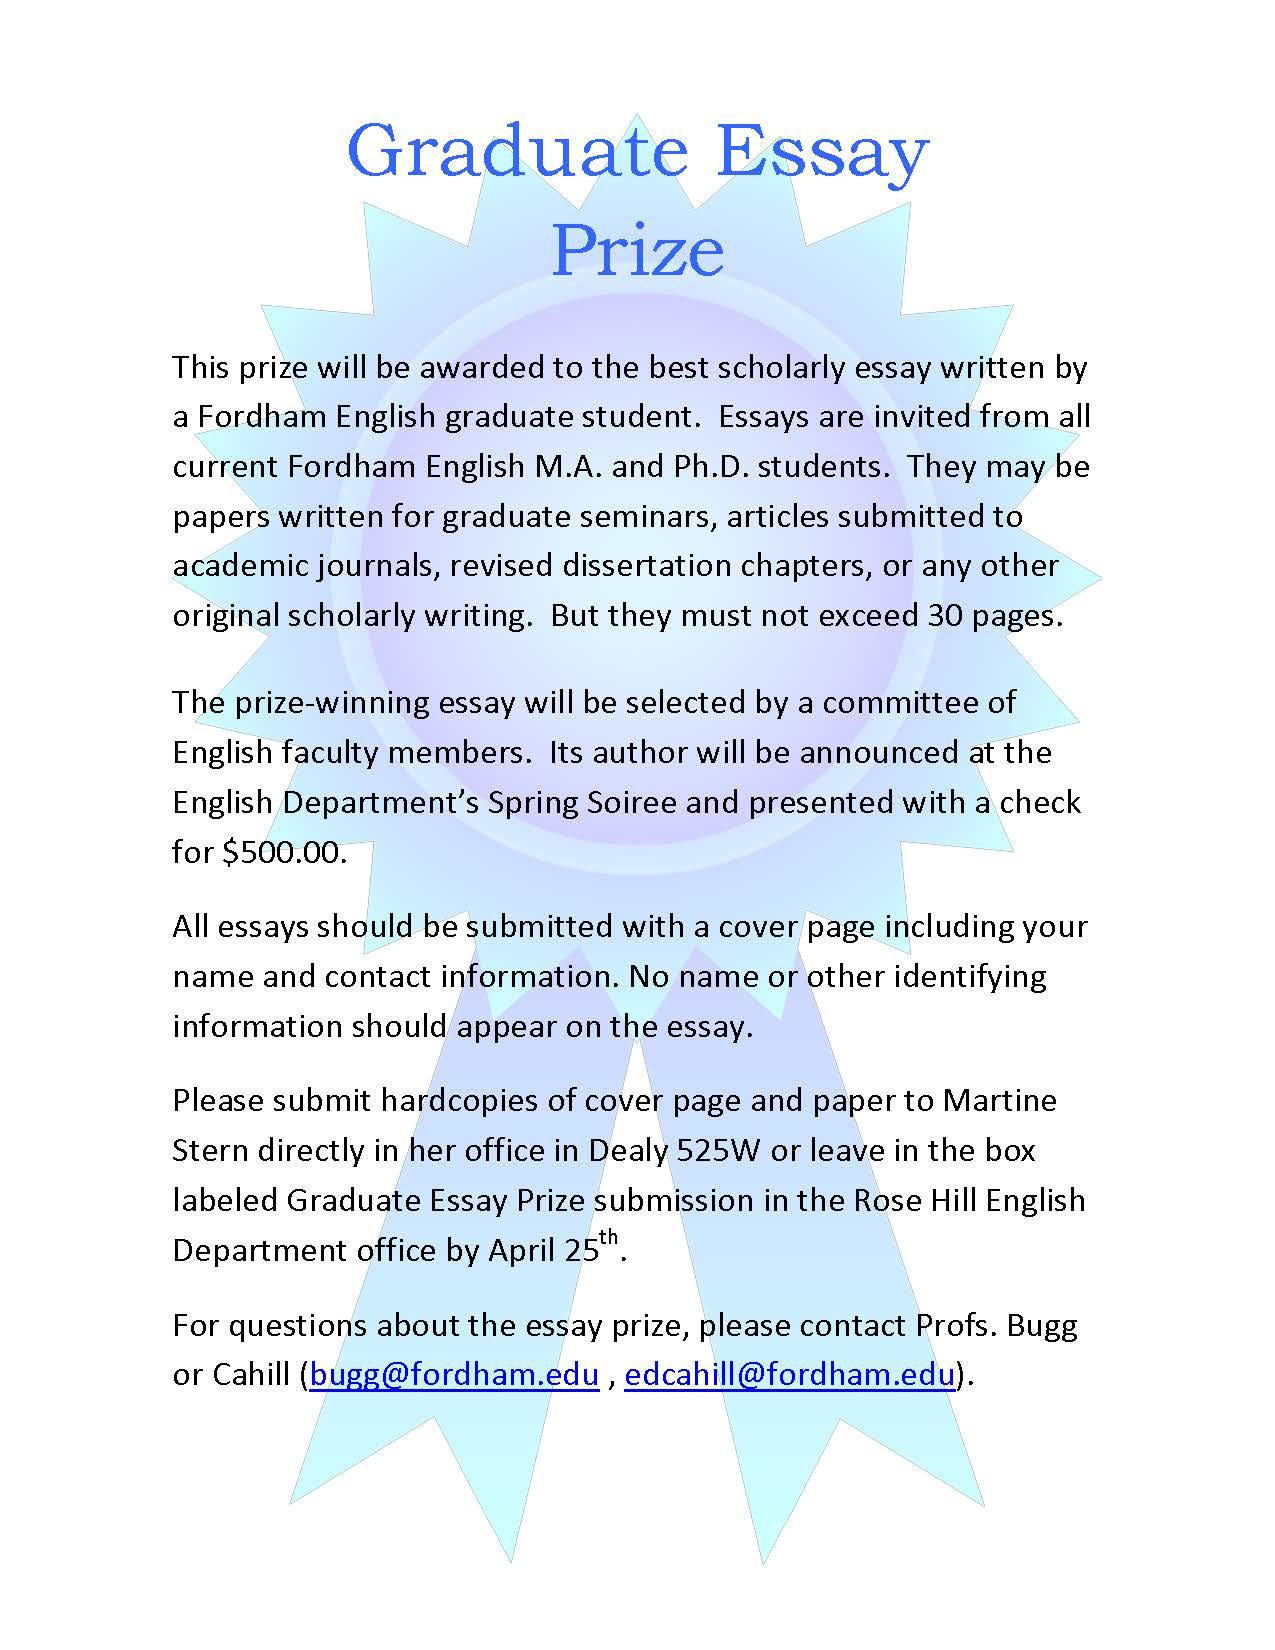 Graduate Essay Prize 2014.jpg